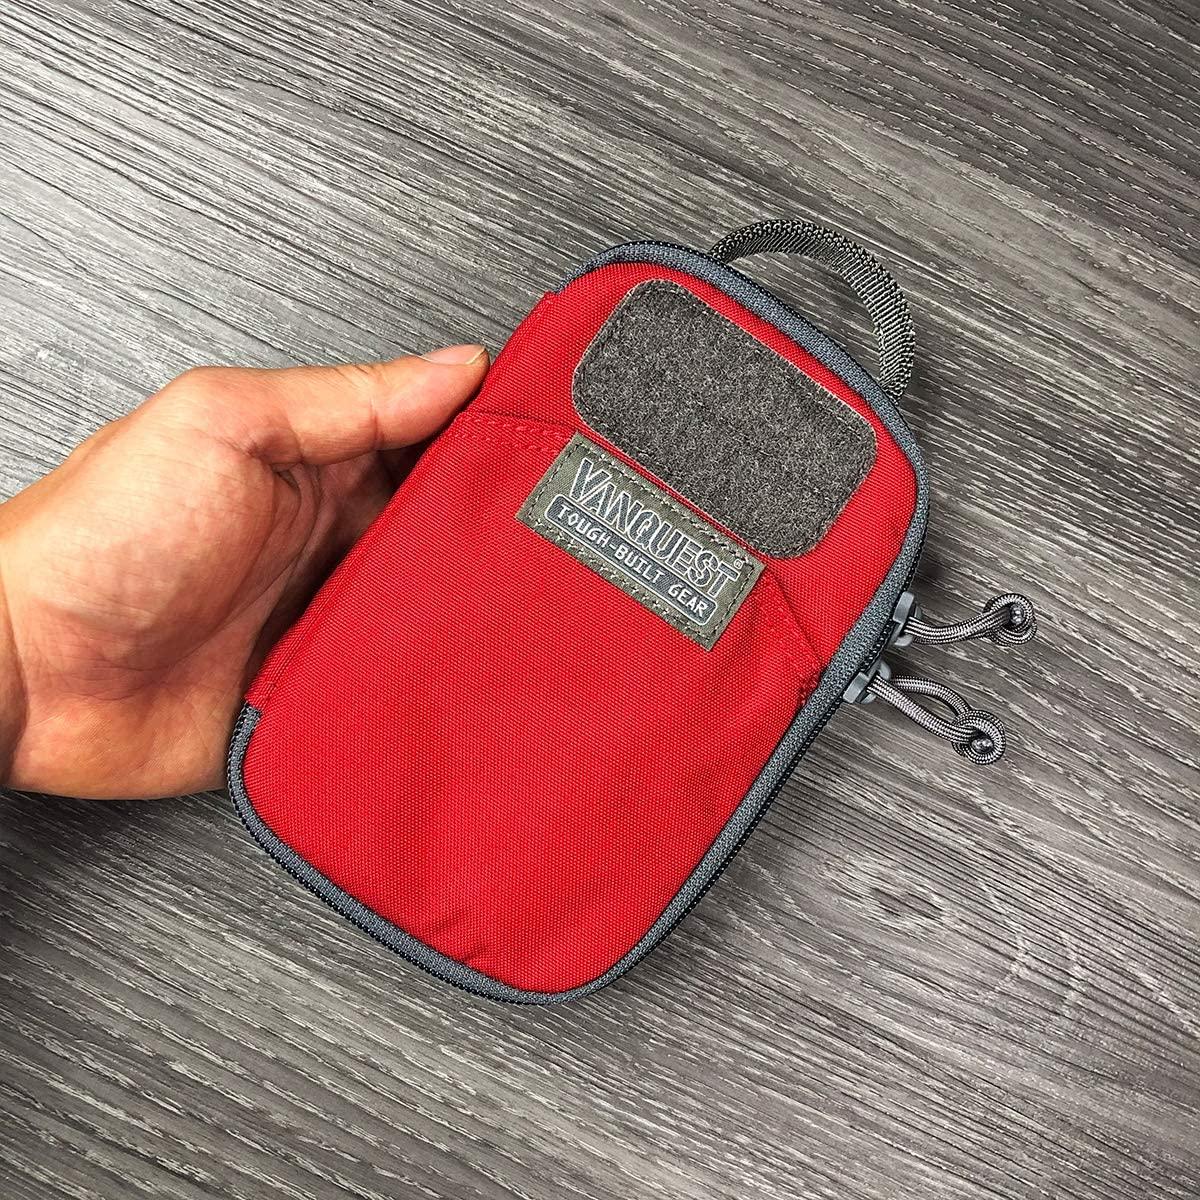 VANQUEST PPM-Slim 2.0 Personal Pocket Maximizer